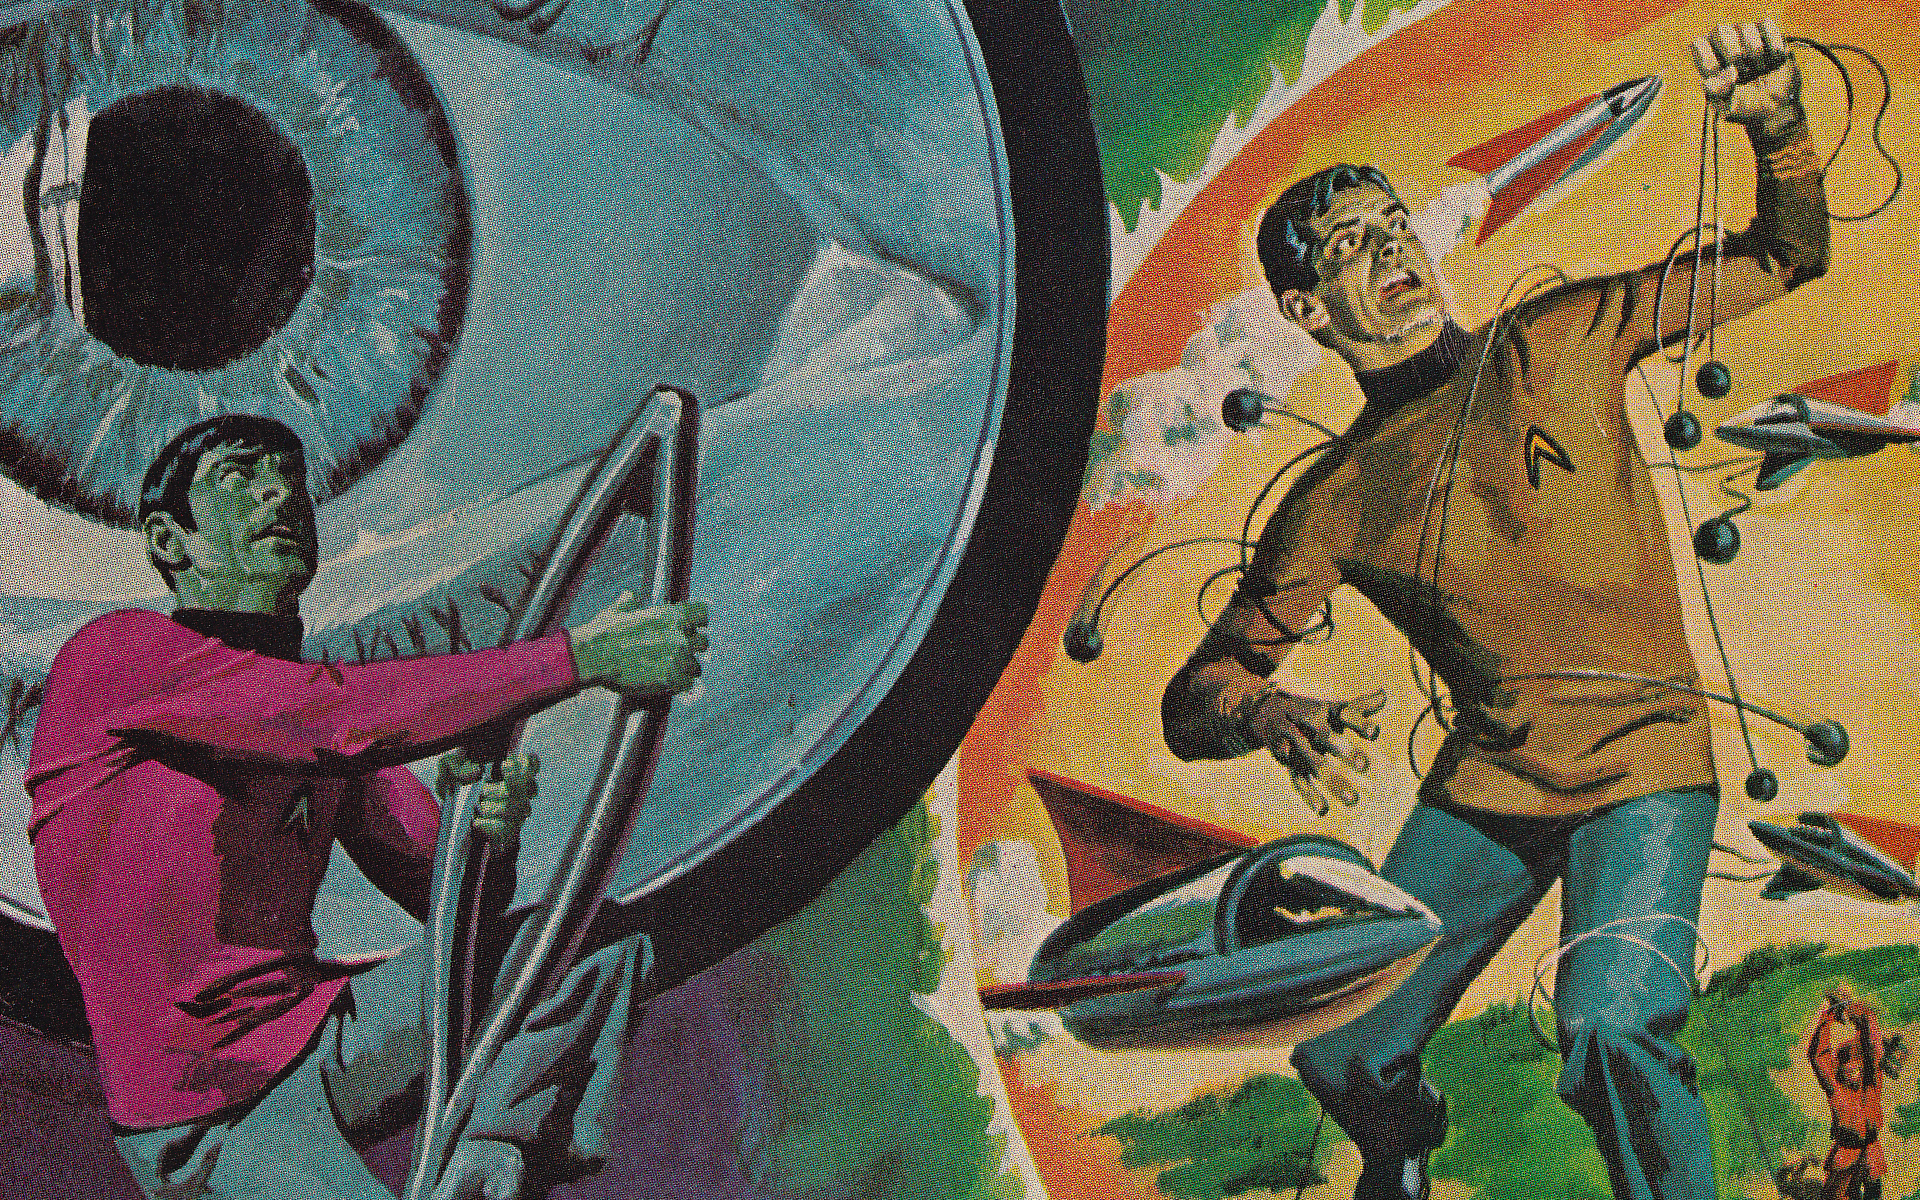 Vintage Star Trek Wallpaper By Futurephonic 1920x1200